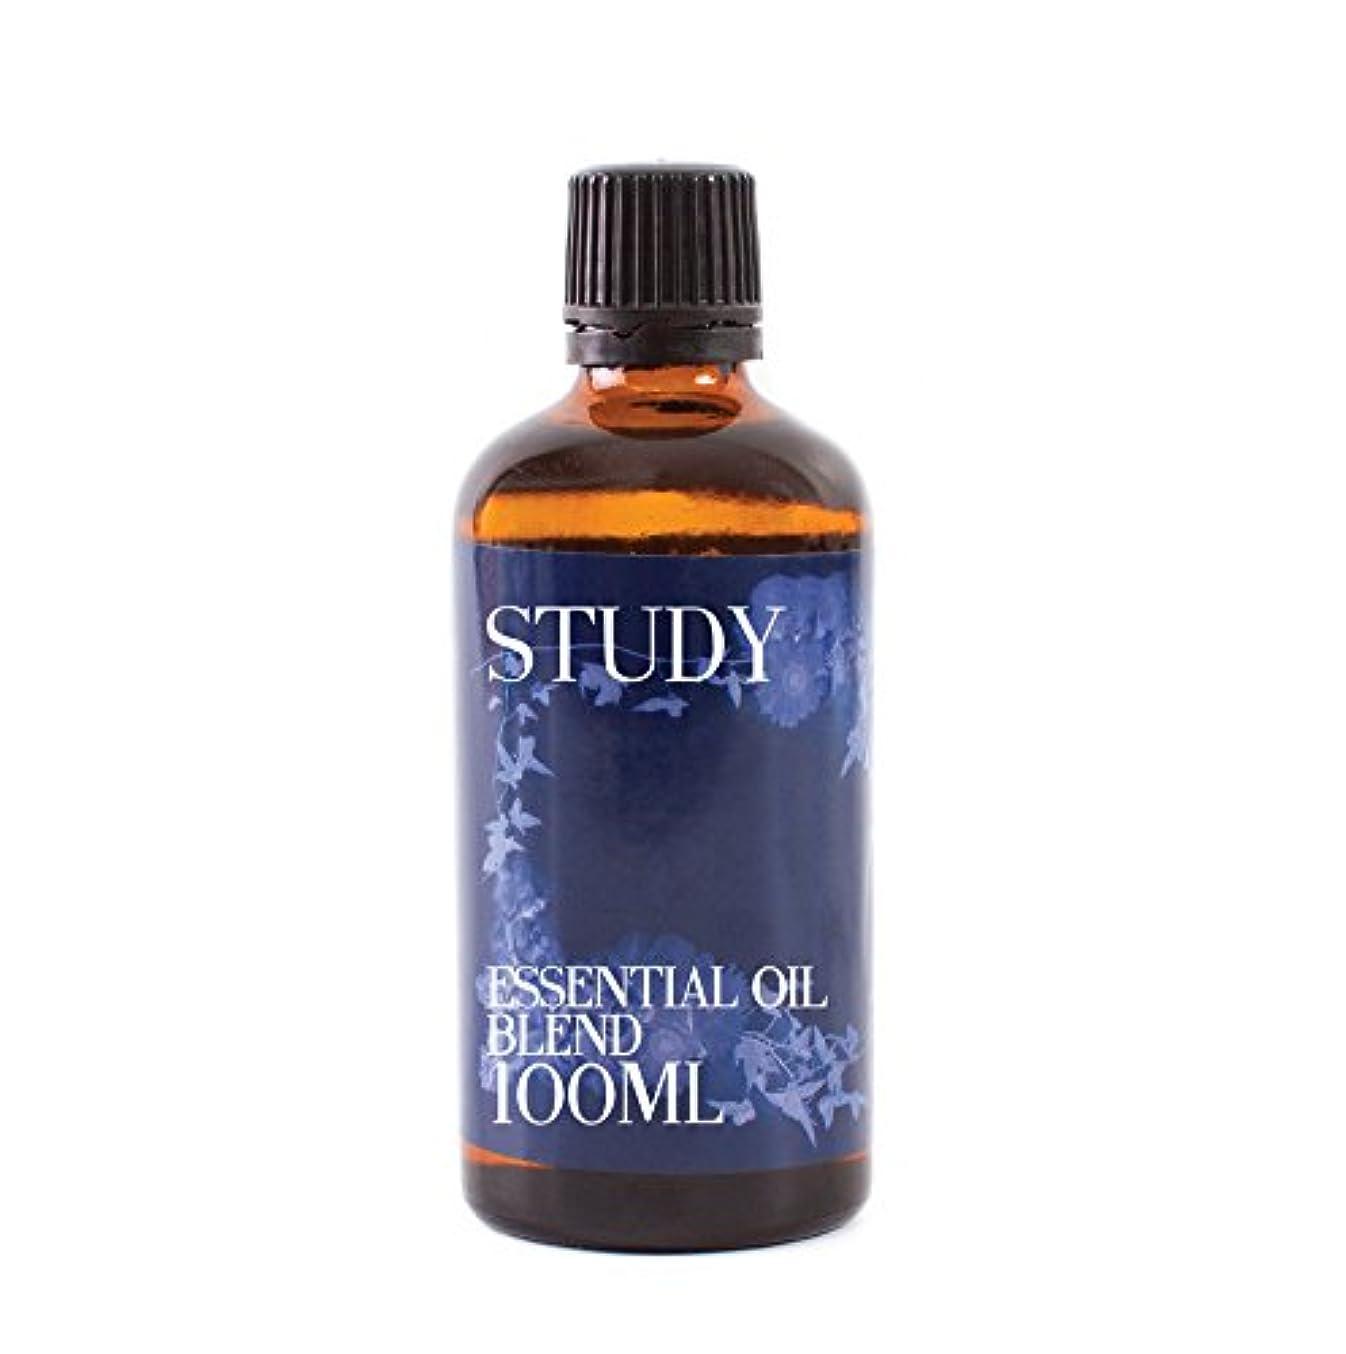 強制廃止地下室Mystic Moments | Study Essential Oil Blend - 100ml - 100% Pure